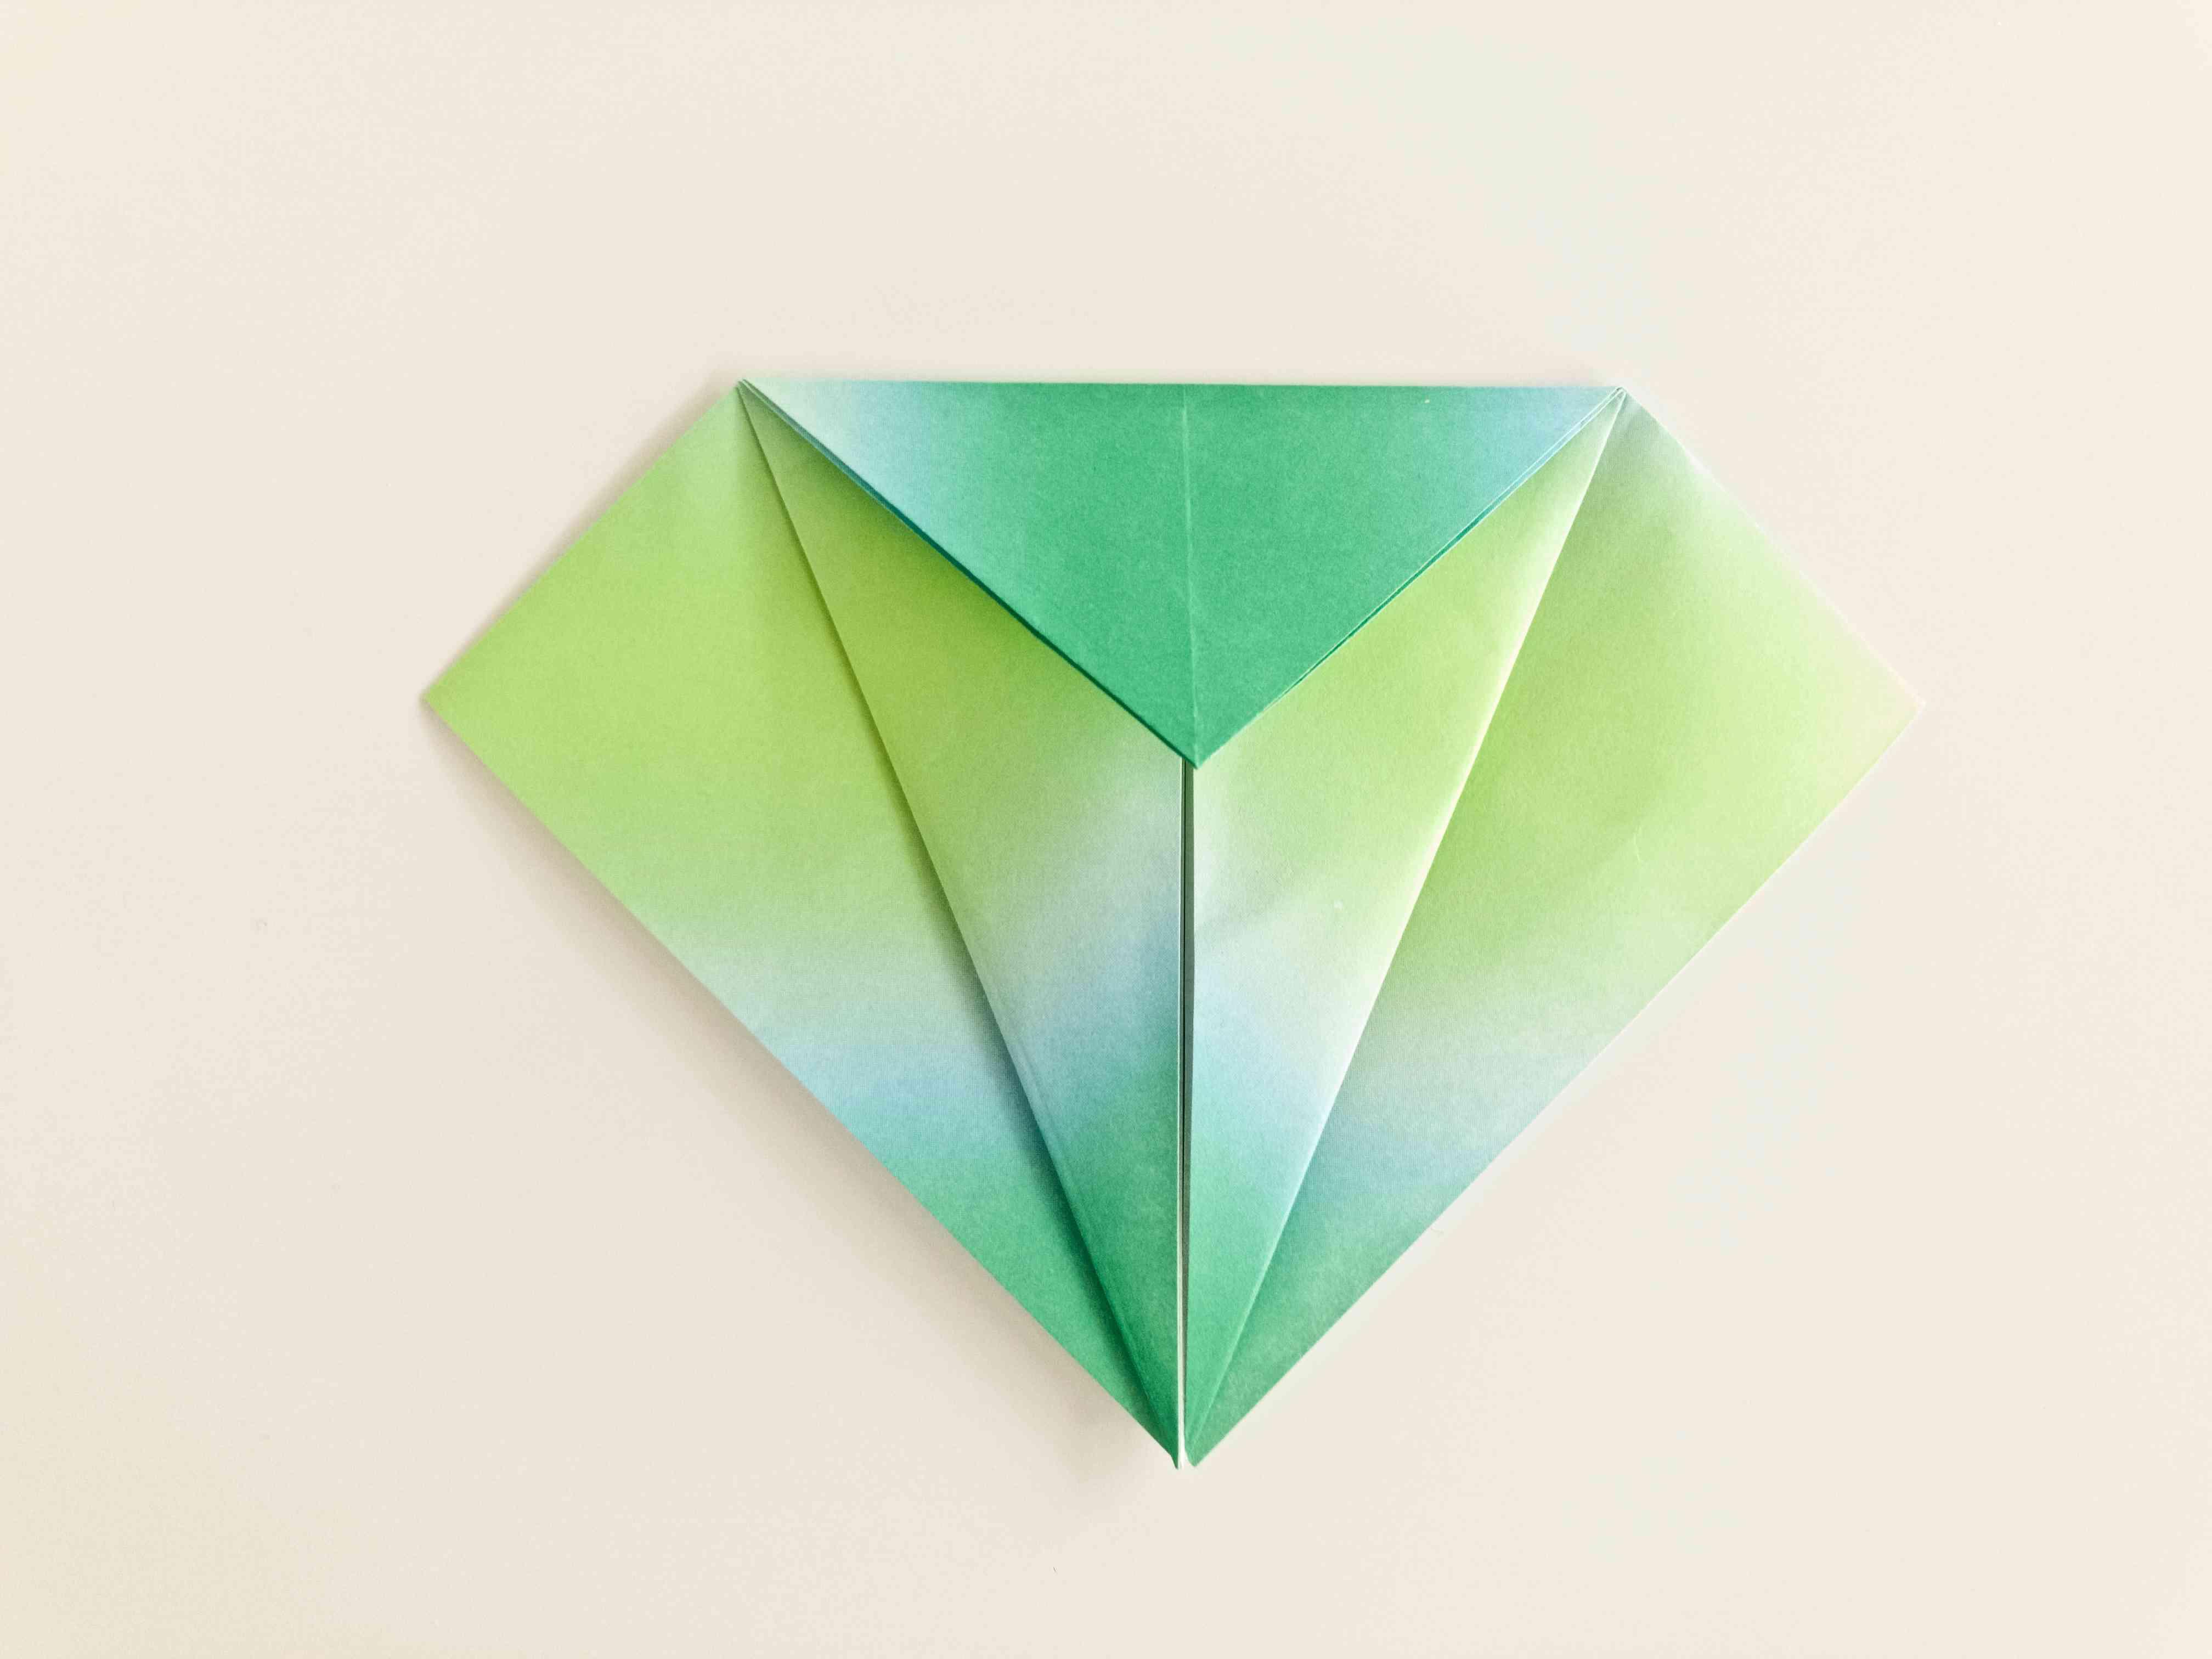 origami crane instructions - squash fold